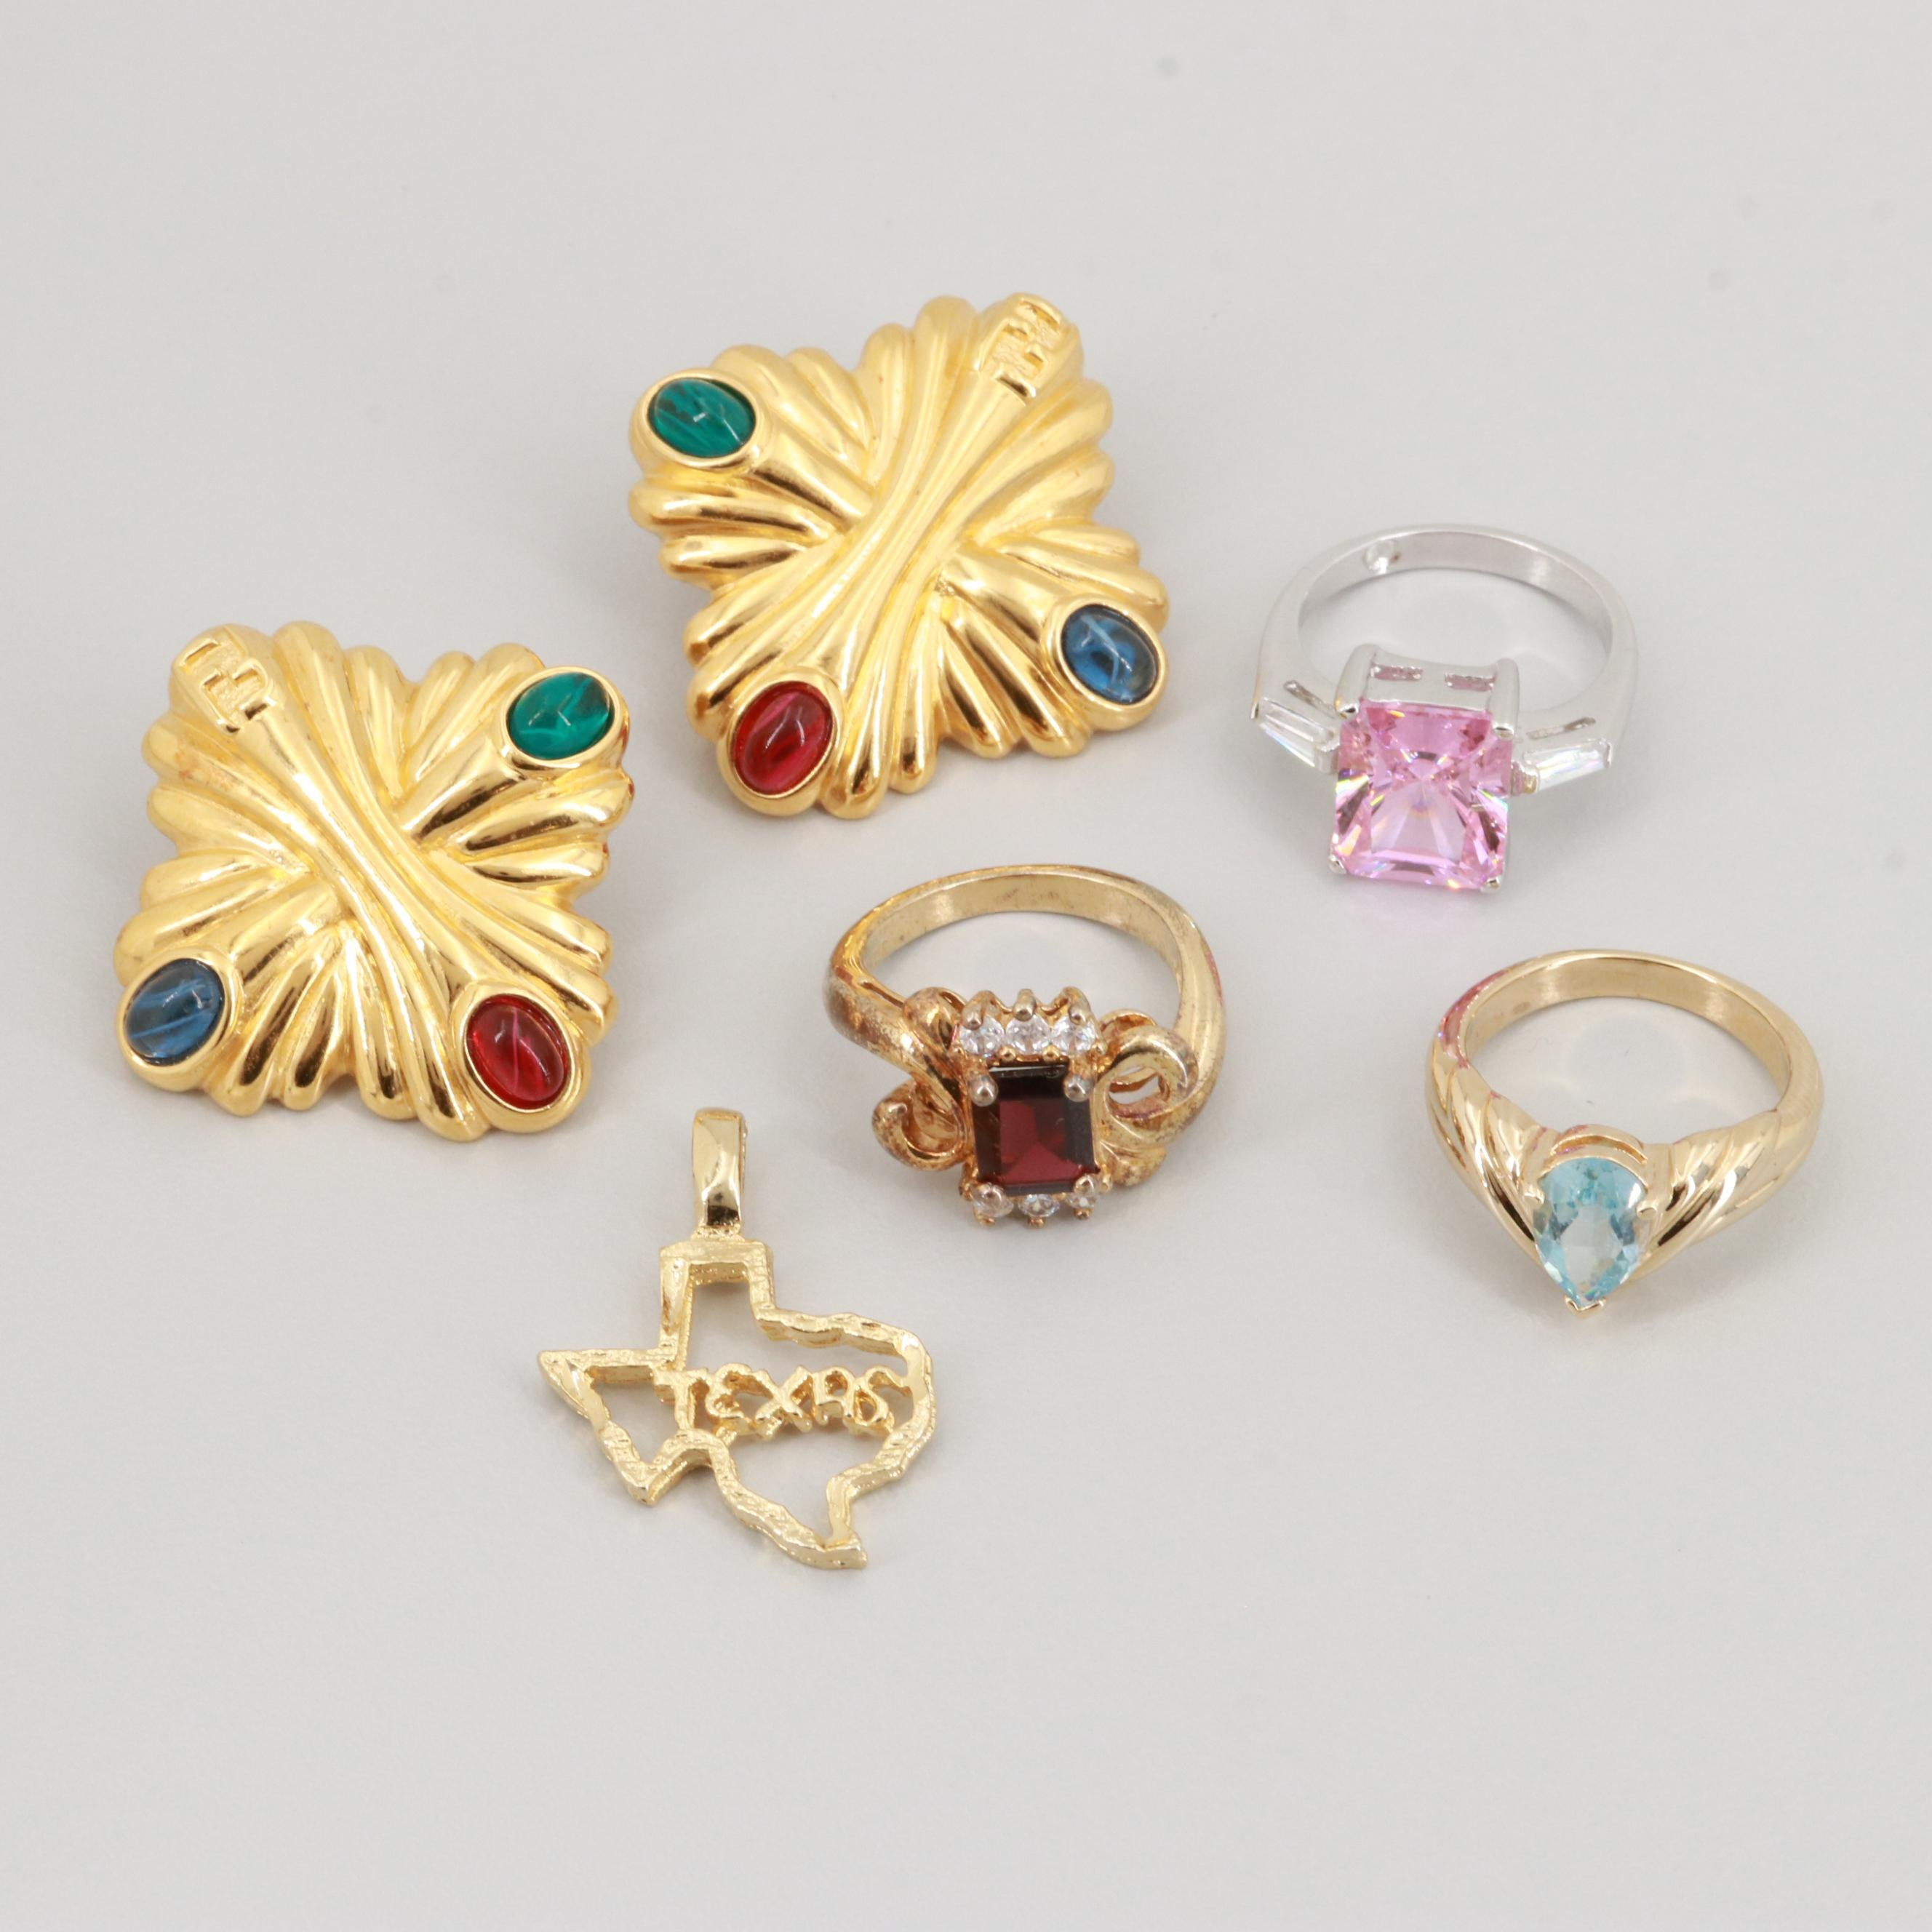 Topaz, Garnet and Cubic Zirconia Jewelry Featuring Fendi Earrings